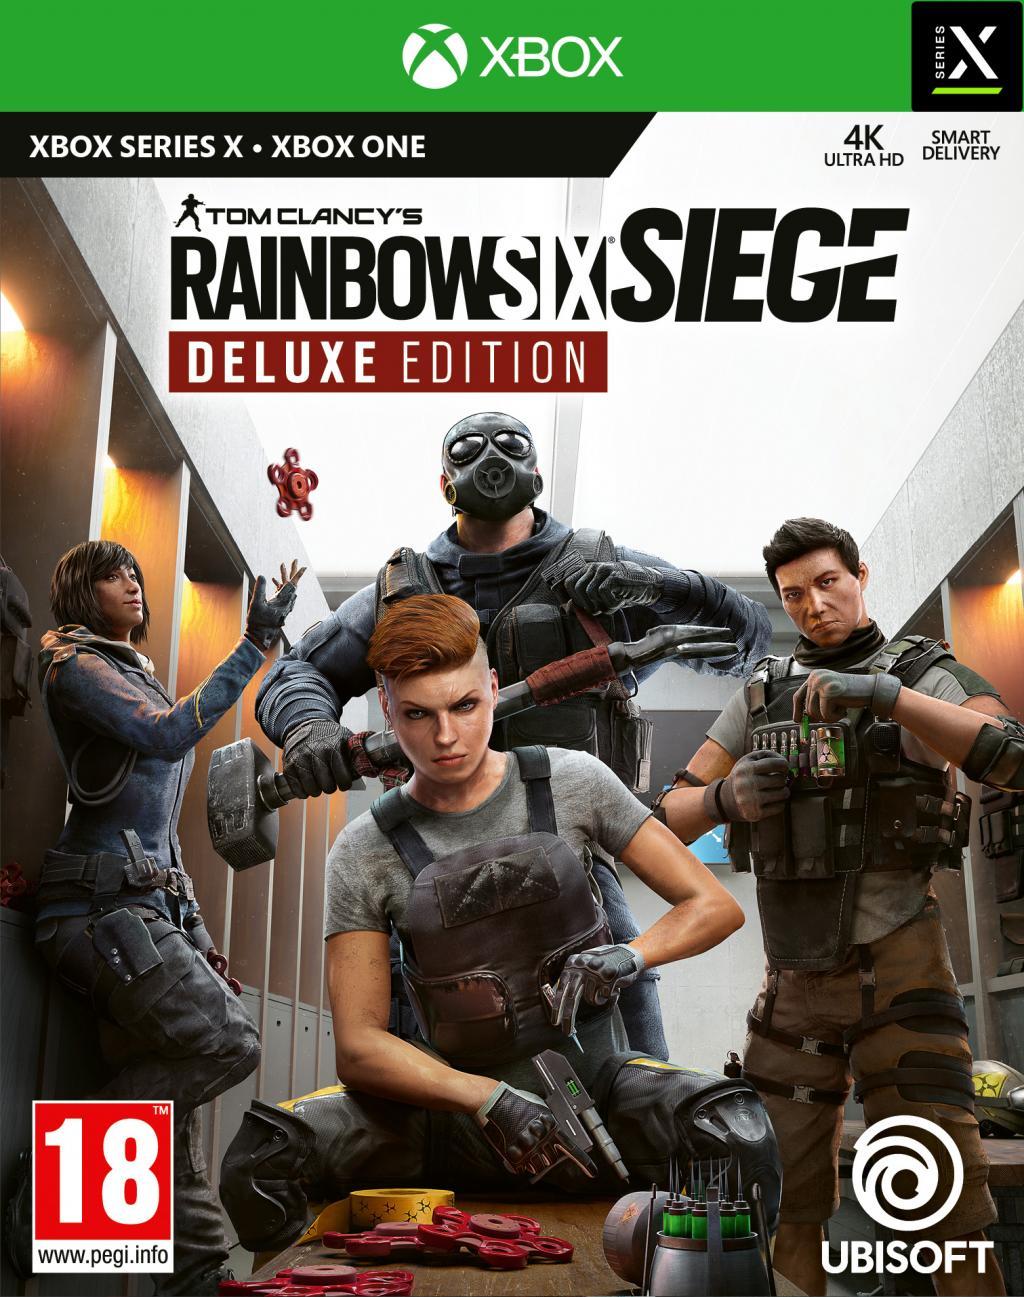 Tom Clancy Rainbow Six Siege Deluxe Edition_1